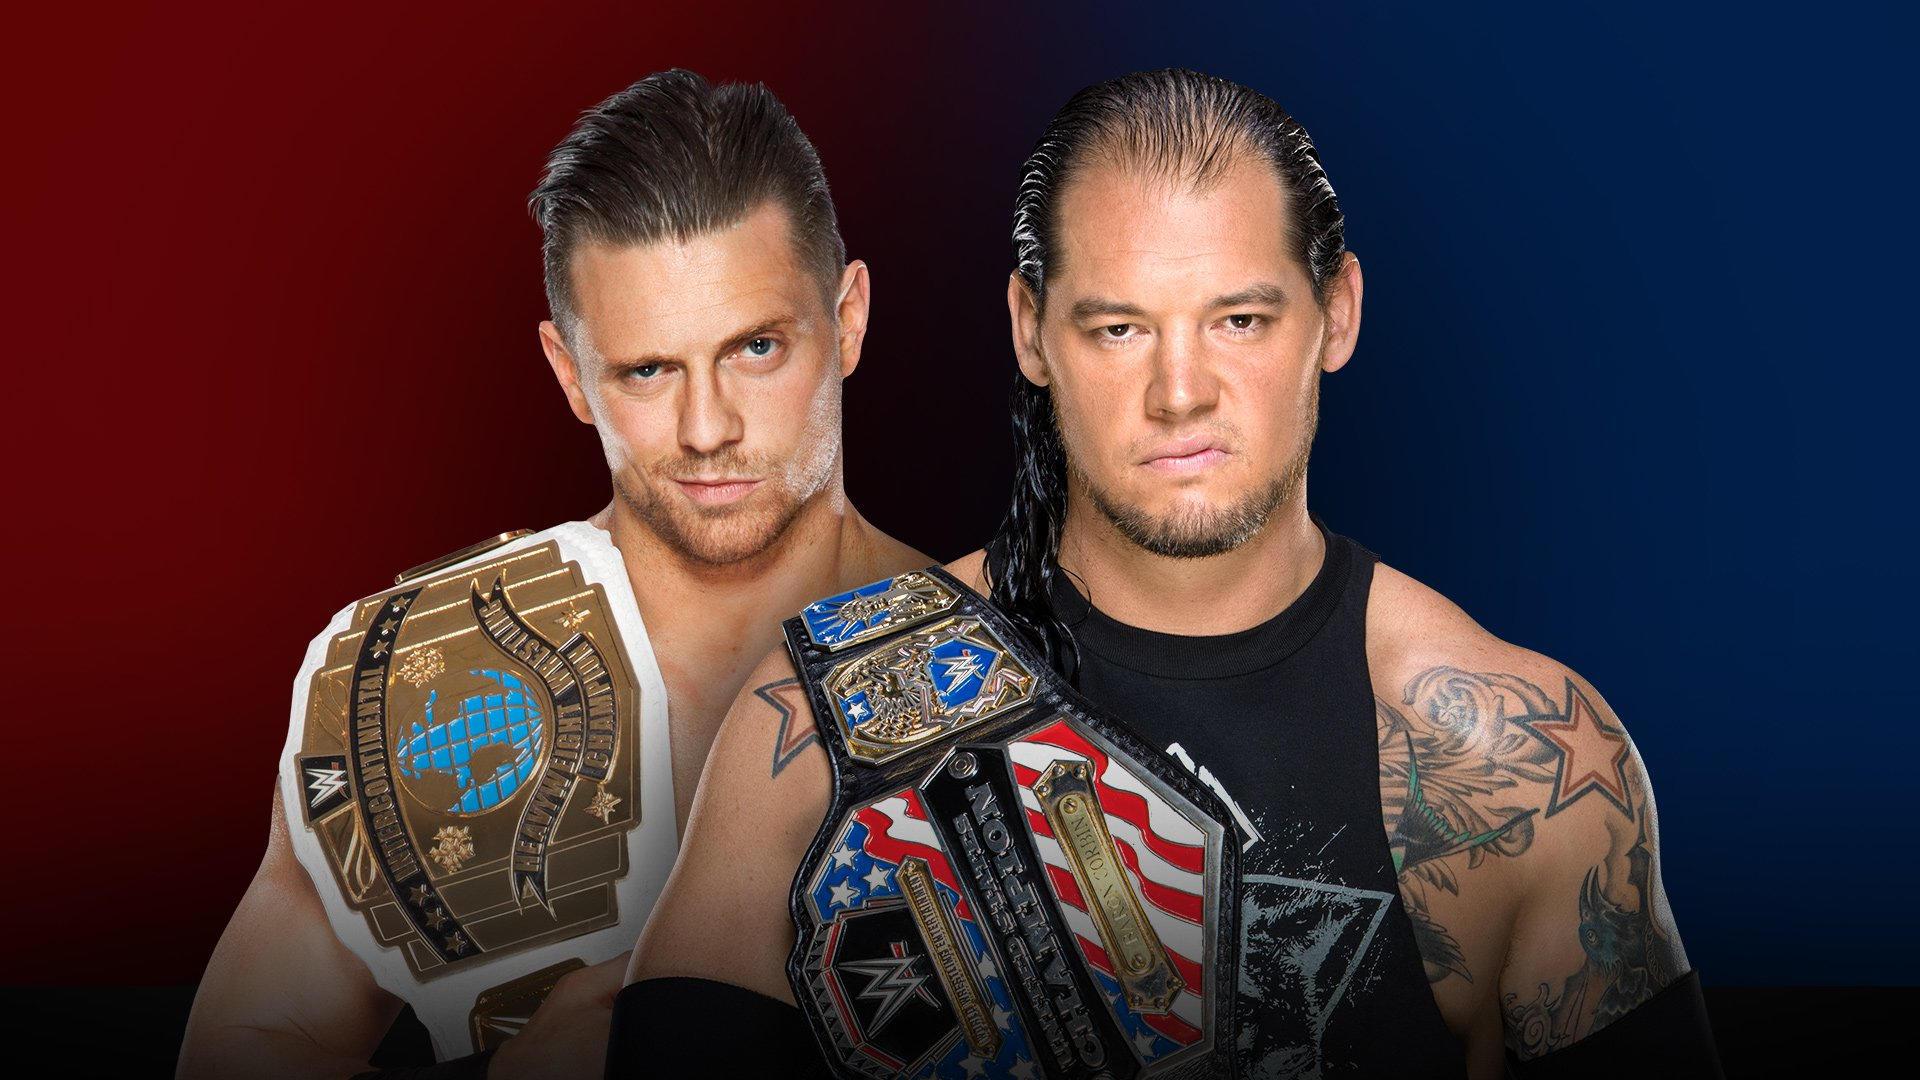 Champion vs Champion